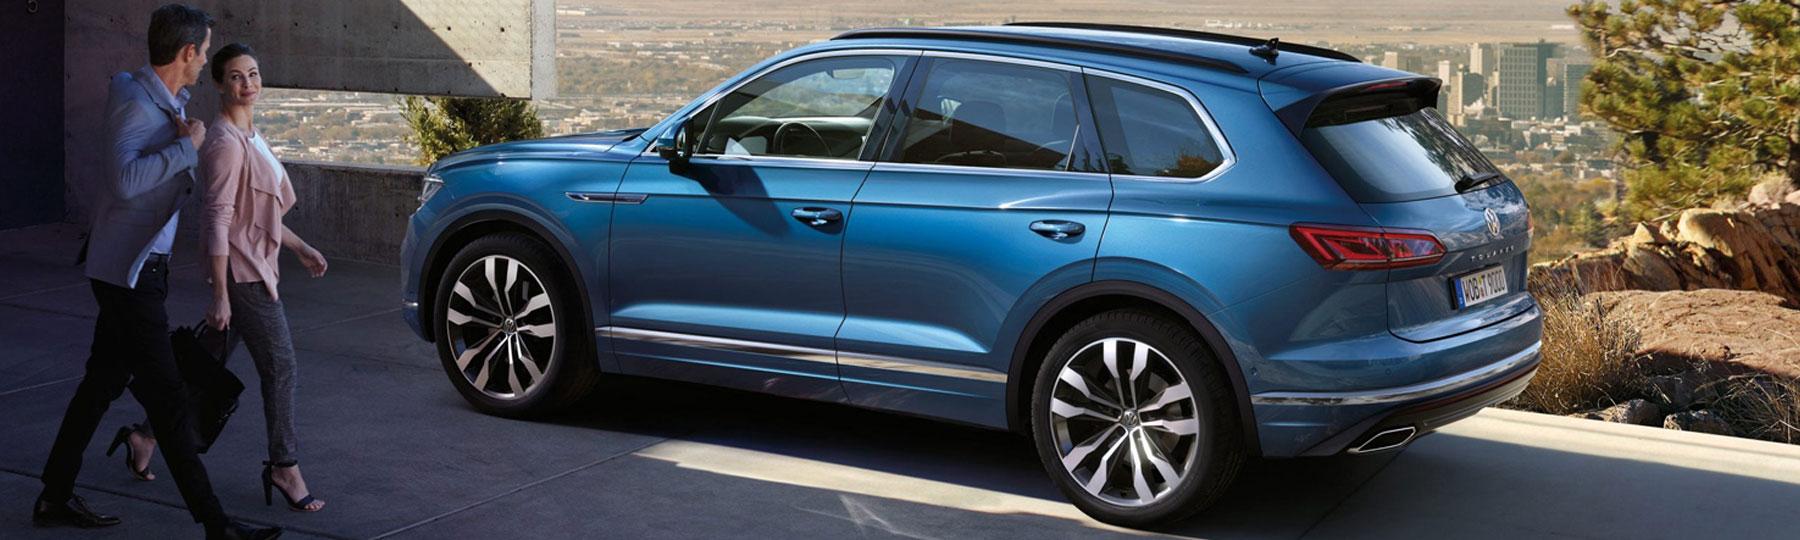 volkswagen Touareg New Car Offer